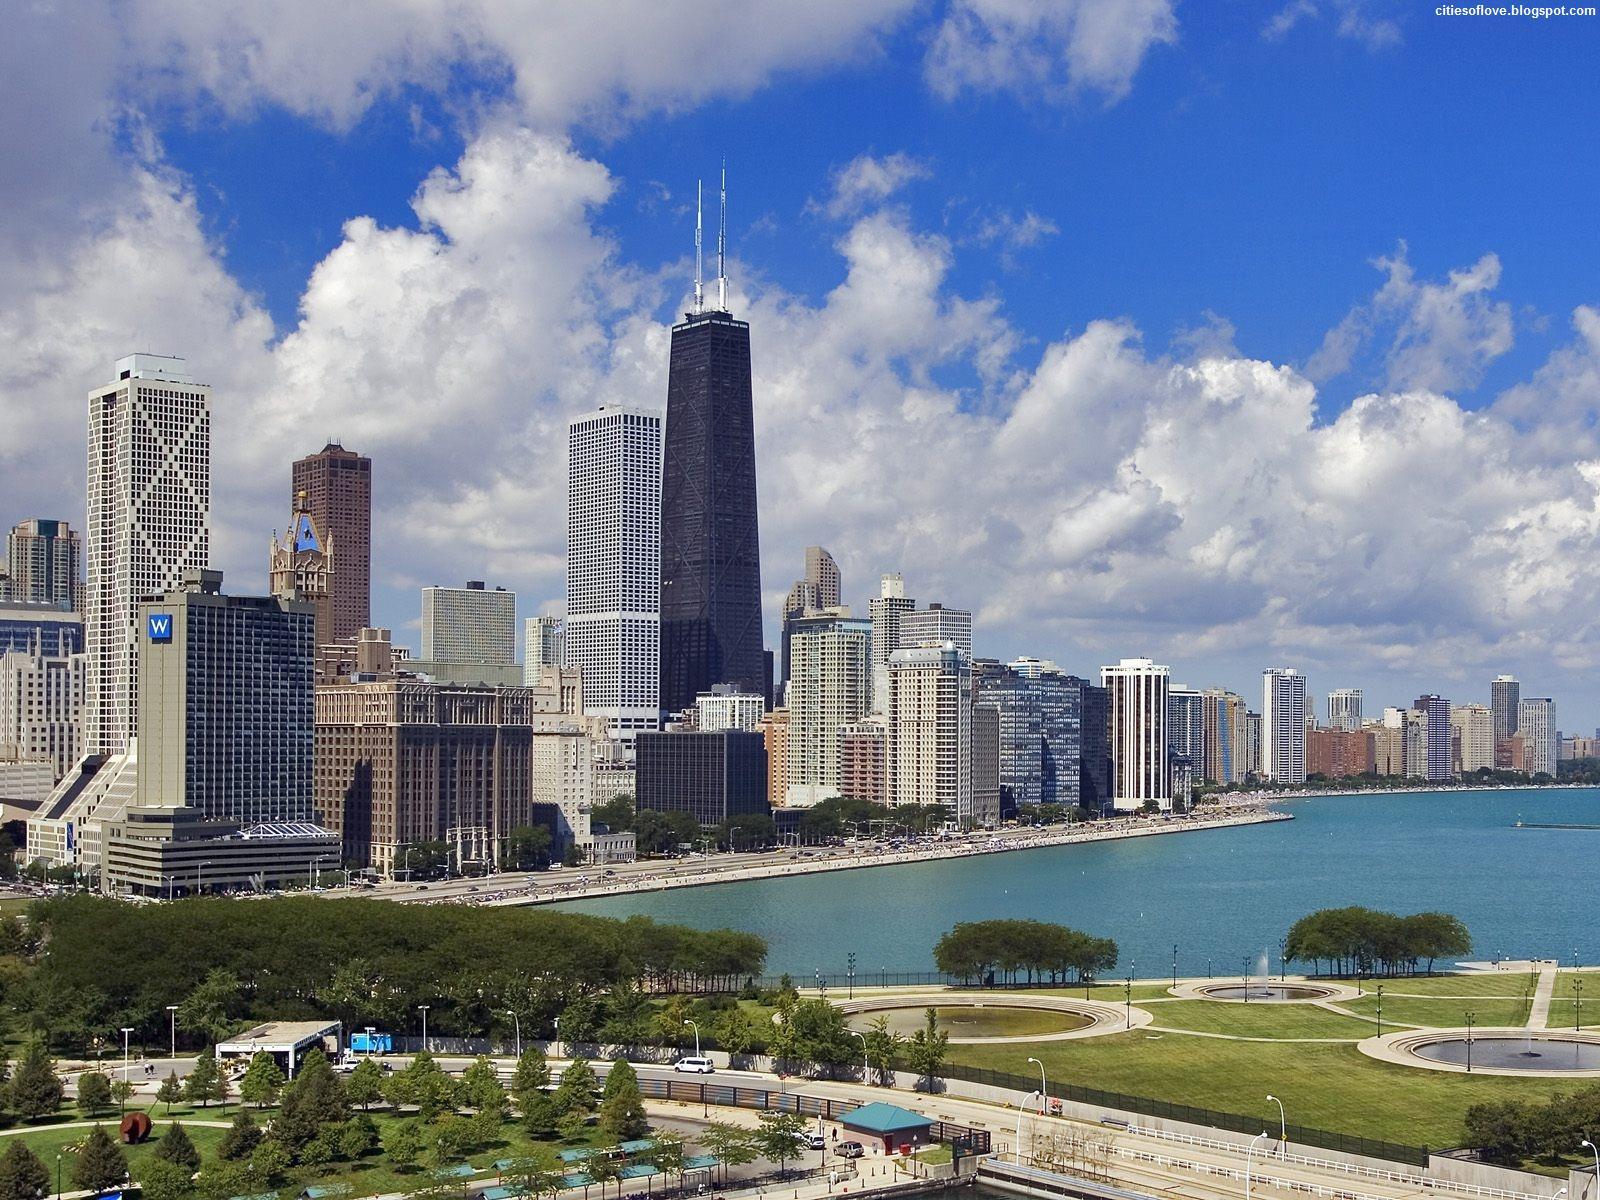 The Gold Coast Of Chicago Illinois Wonderful Atmosphere